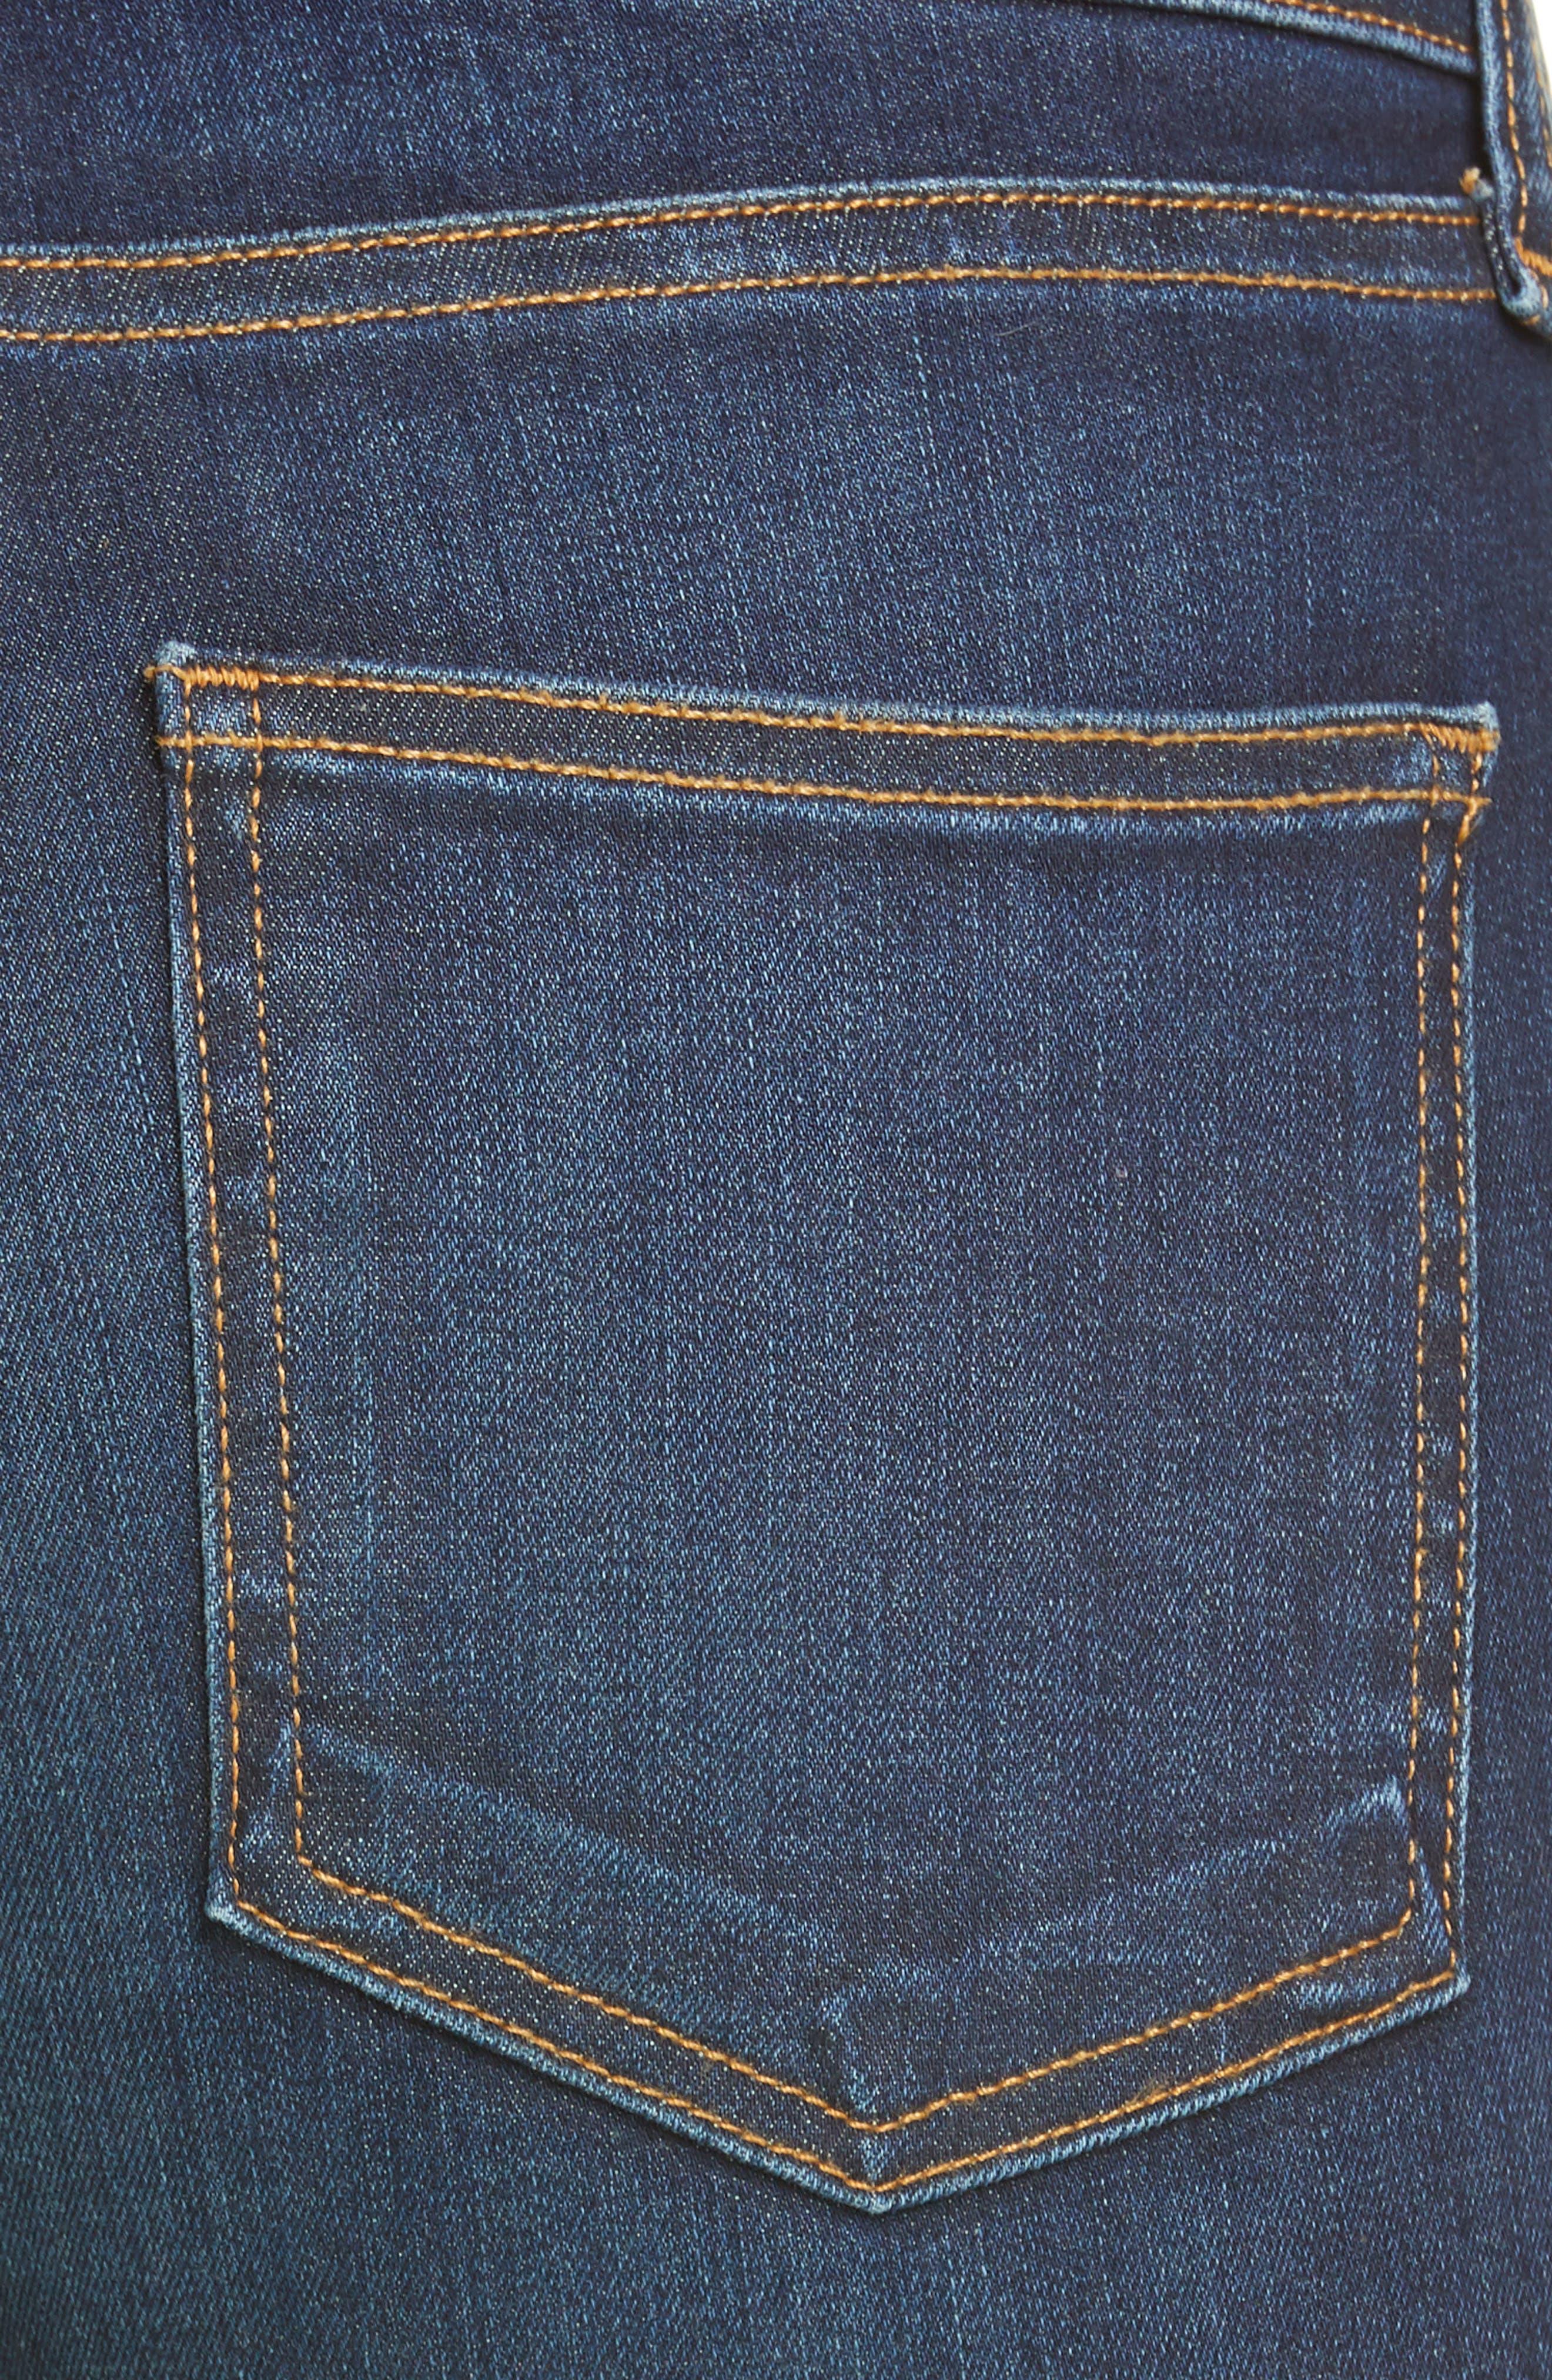 VERONICA BEARD, Carolyn Side Vent Baby Boot Jeans, Alternate thumbnail 6, color, DARK VINTAGE